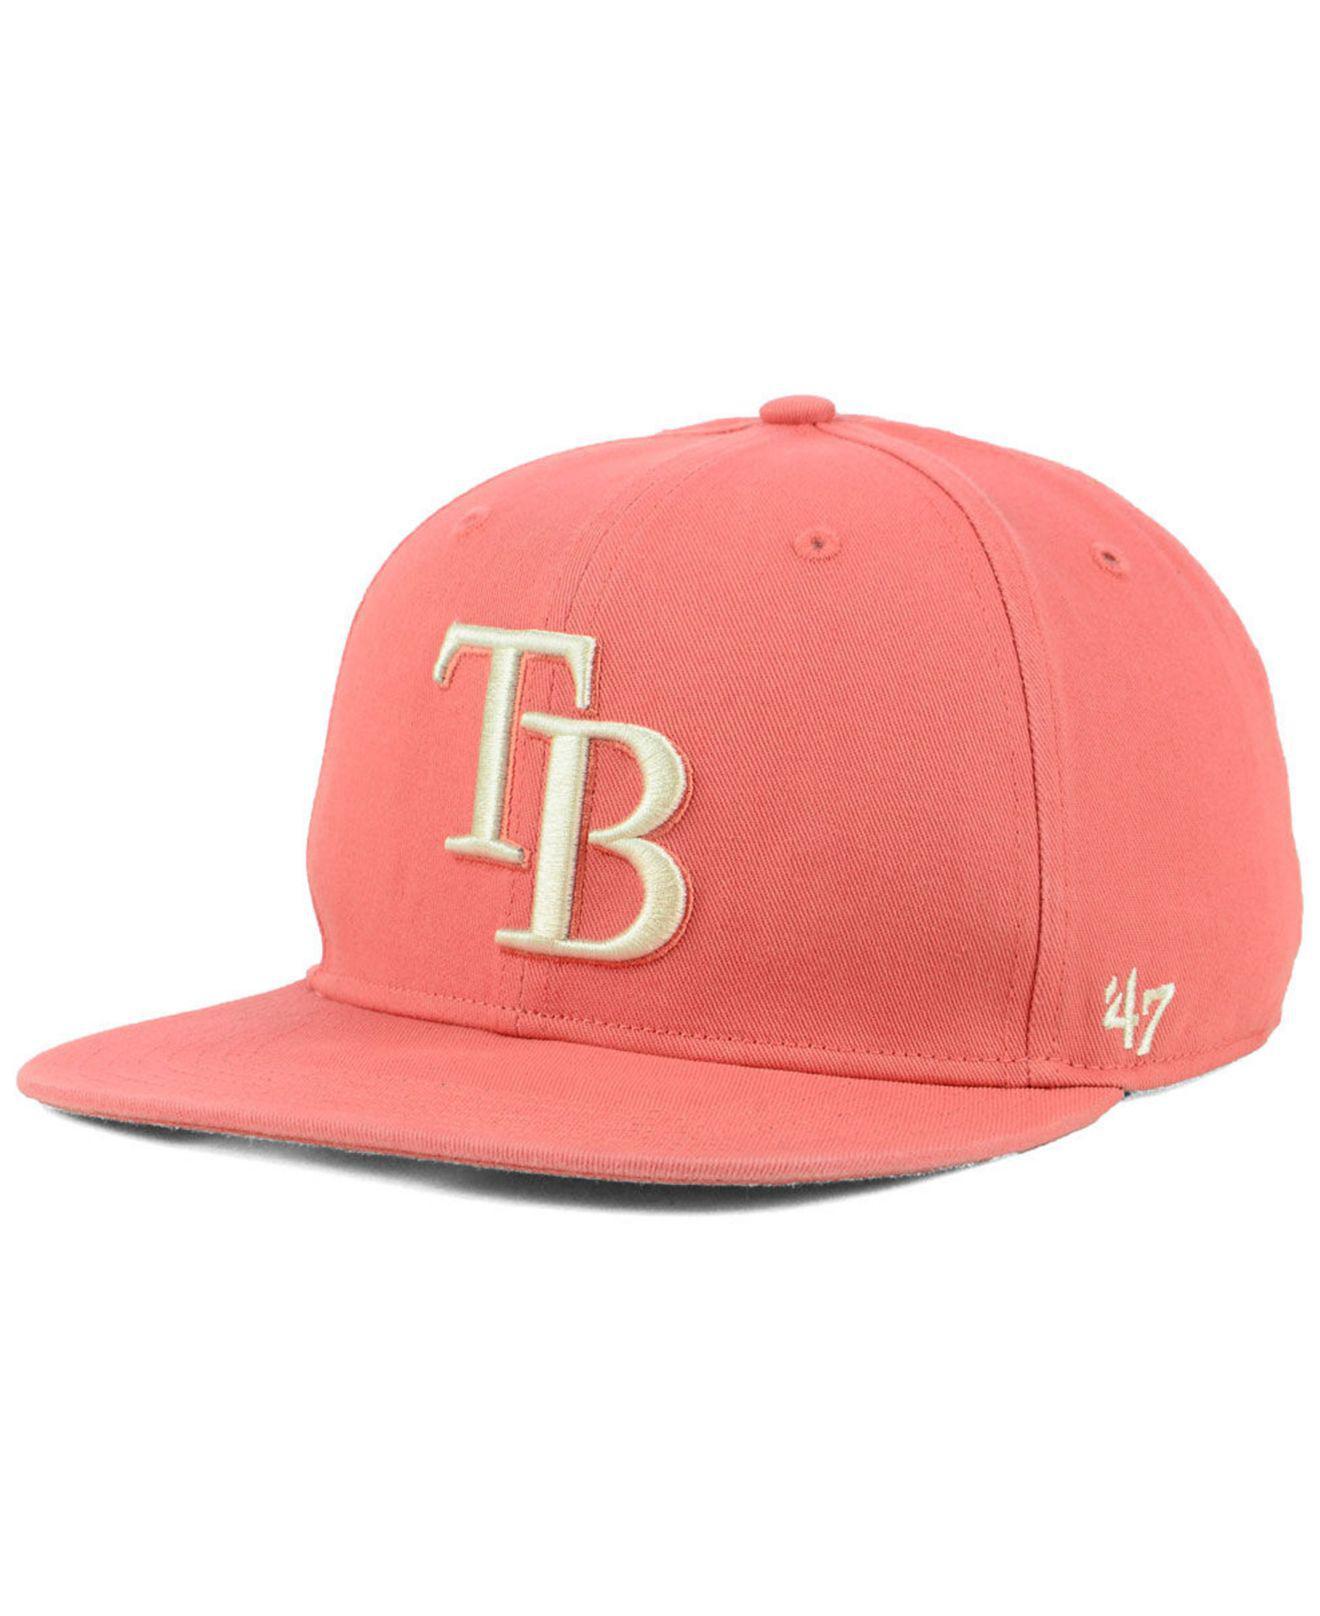 separation shoes 873ba a38de 47 Brand. Men s Pink Tampa Bay Rays Island Snapback Cap